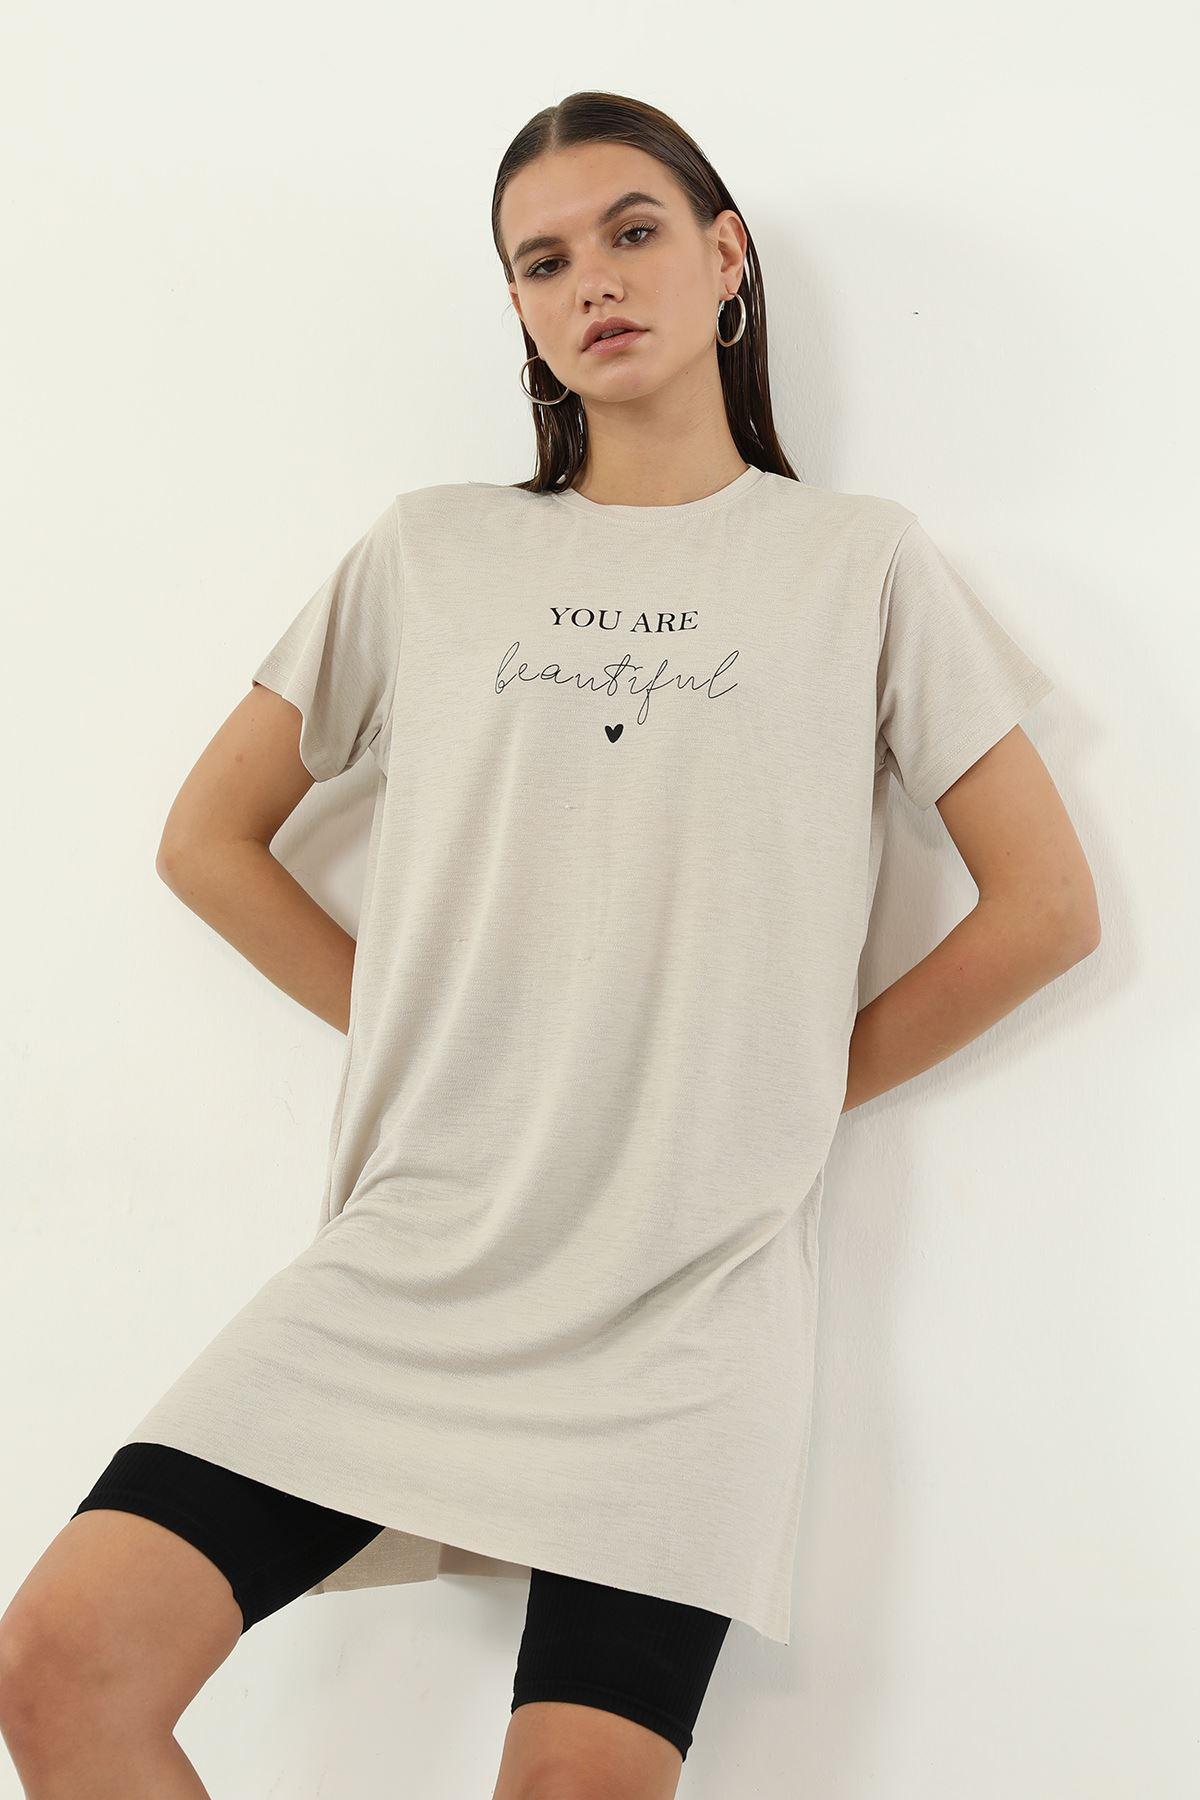 You Are Baskılı T-shirt-Taş